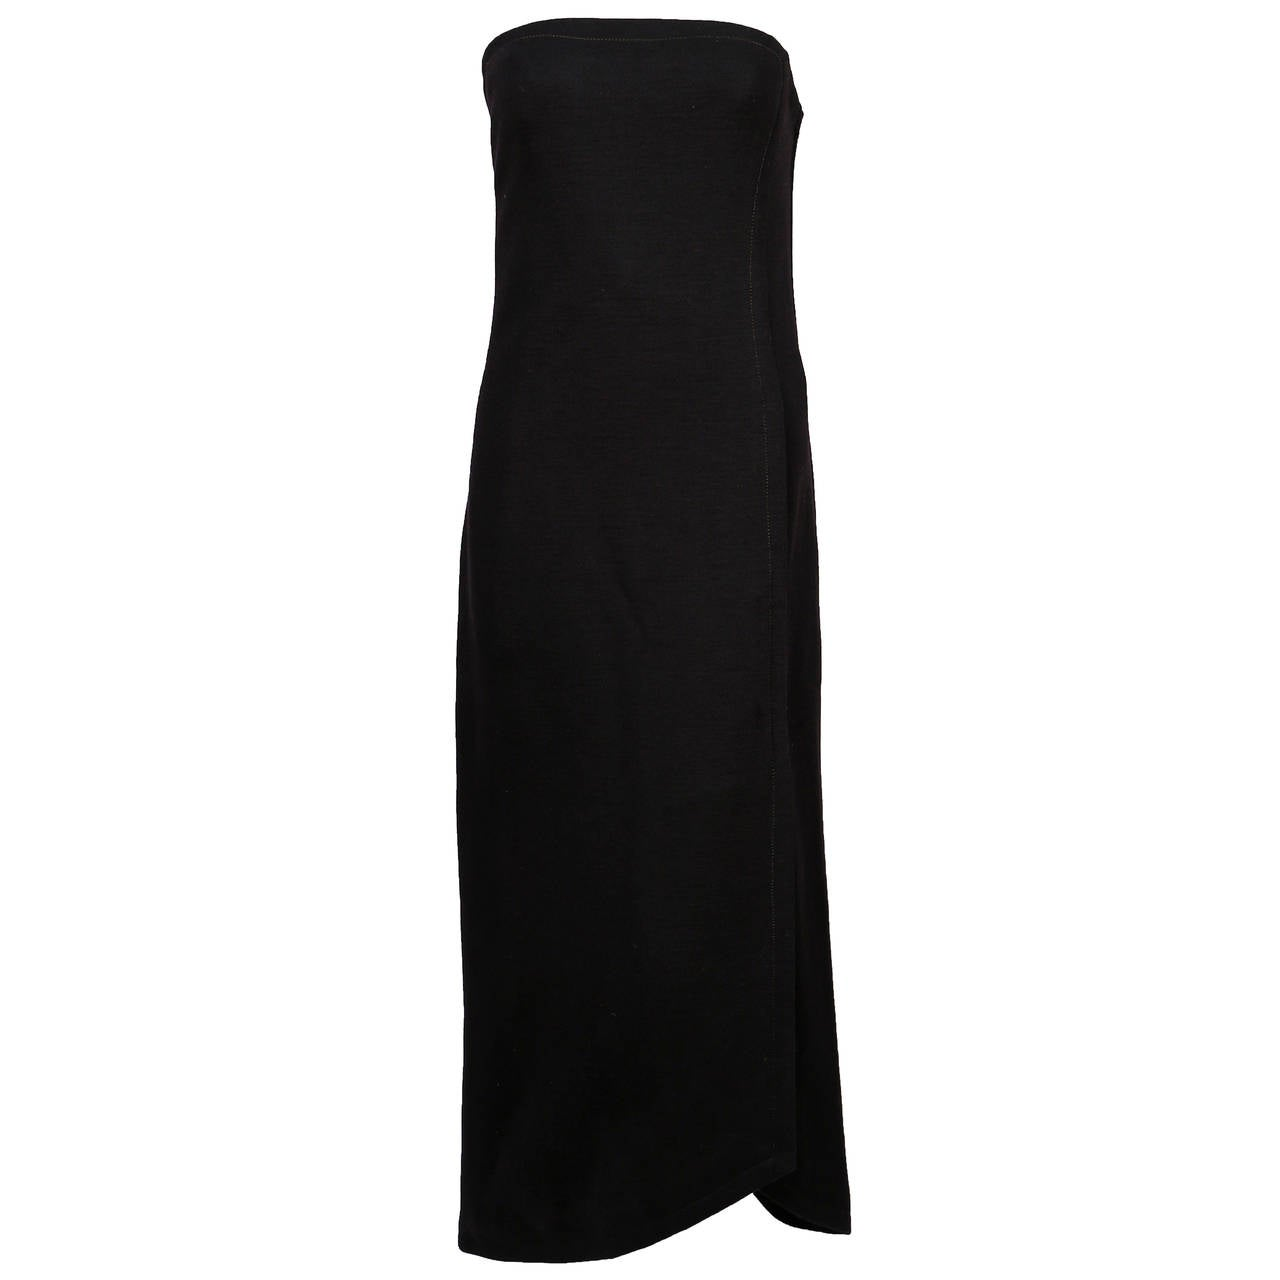 1960's GALANOS black wool strapless dress with asymmetrical seaming & hemline